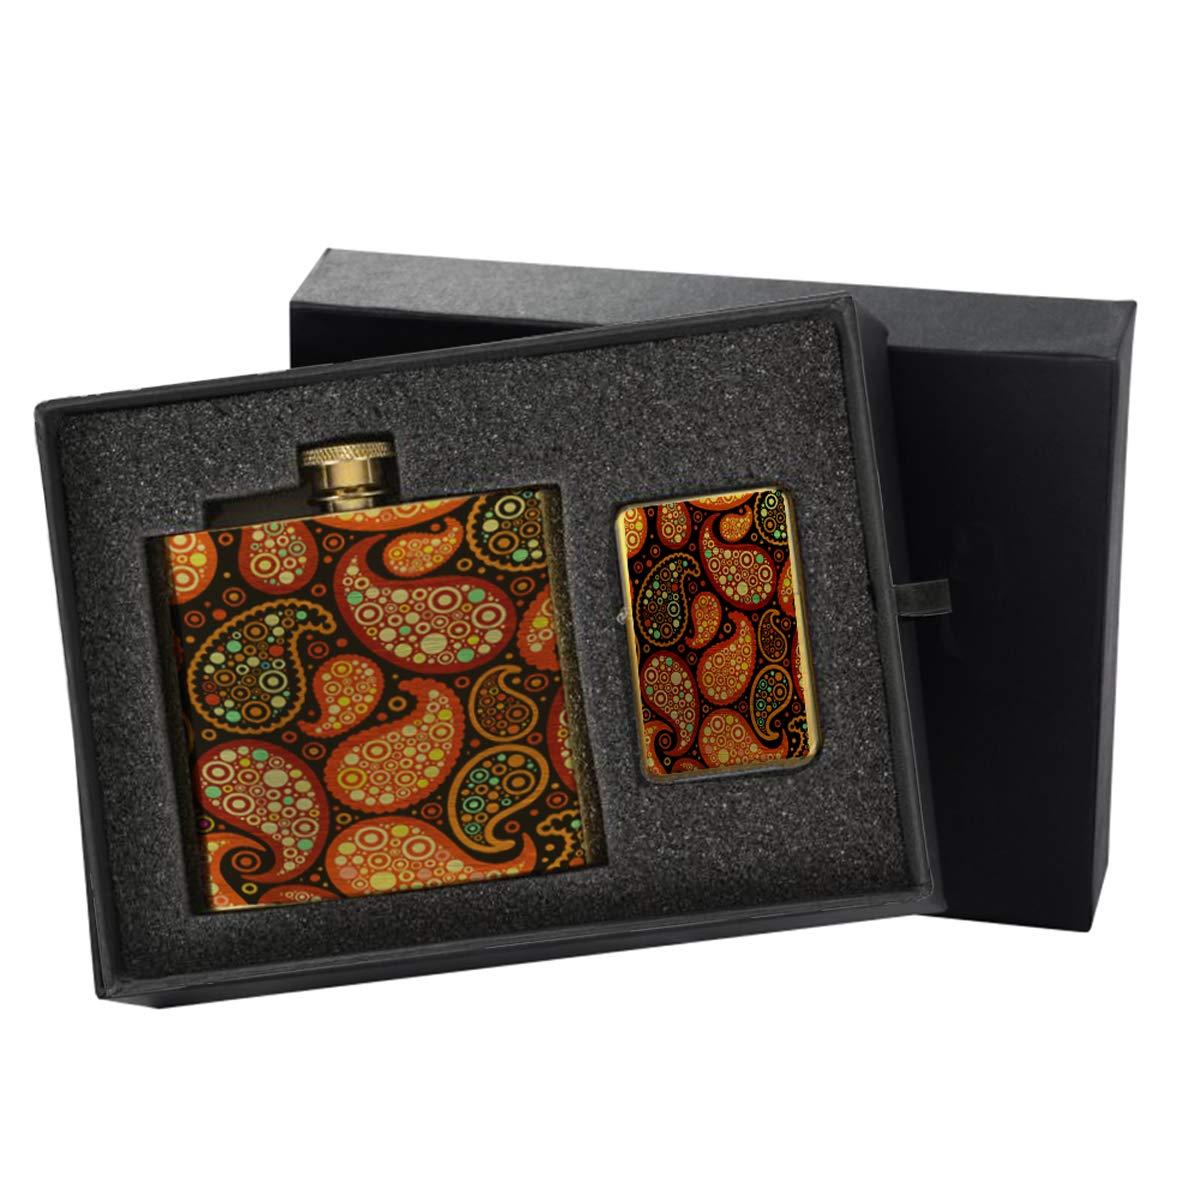 Paisley - Gold Lighter and Pocket Hip Liquor Flask Survival Camping Gift Box Set